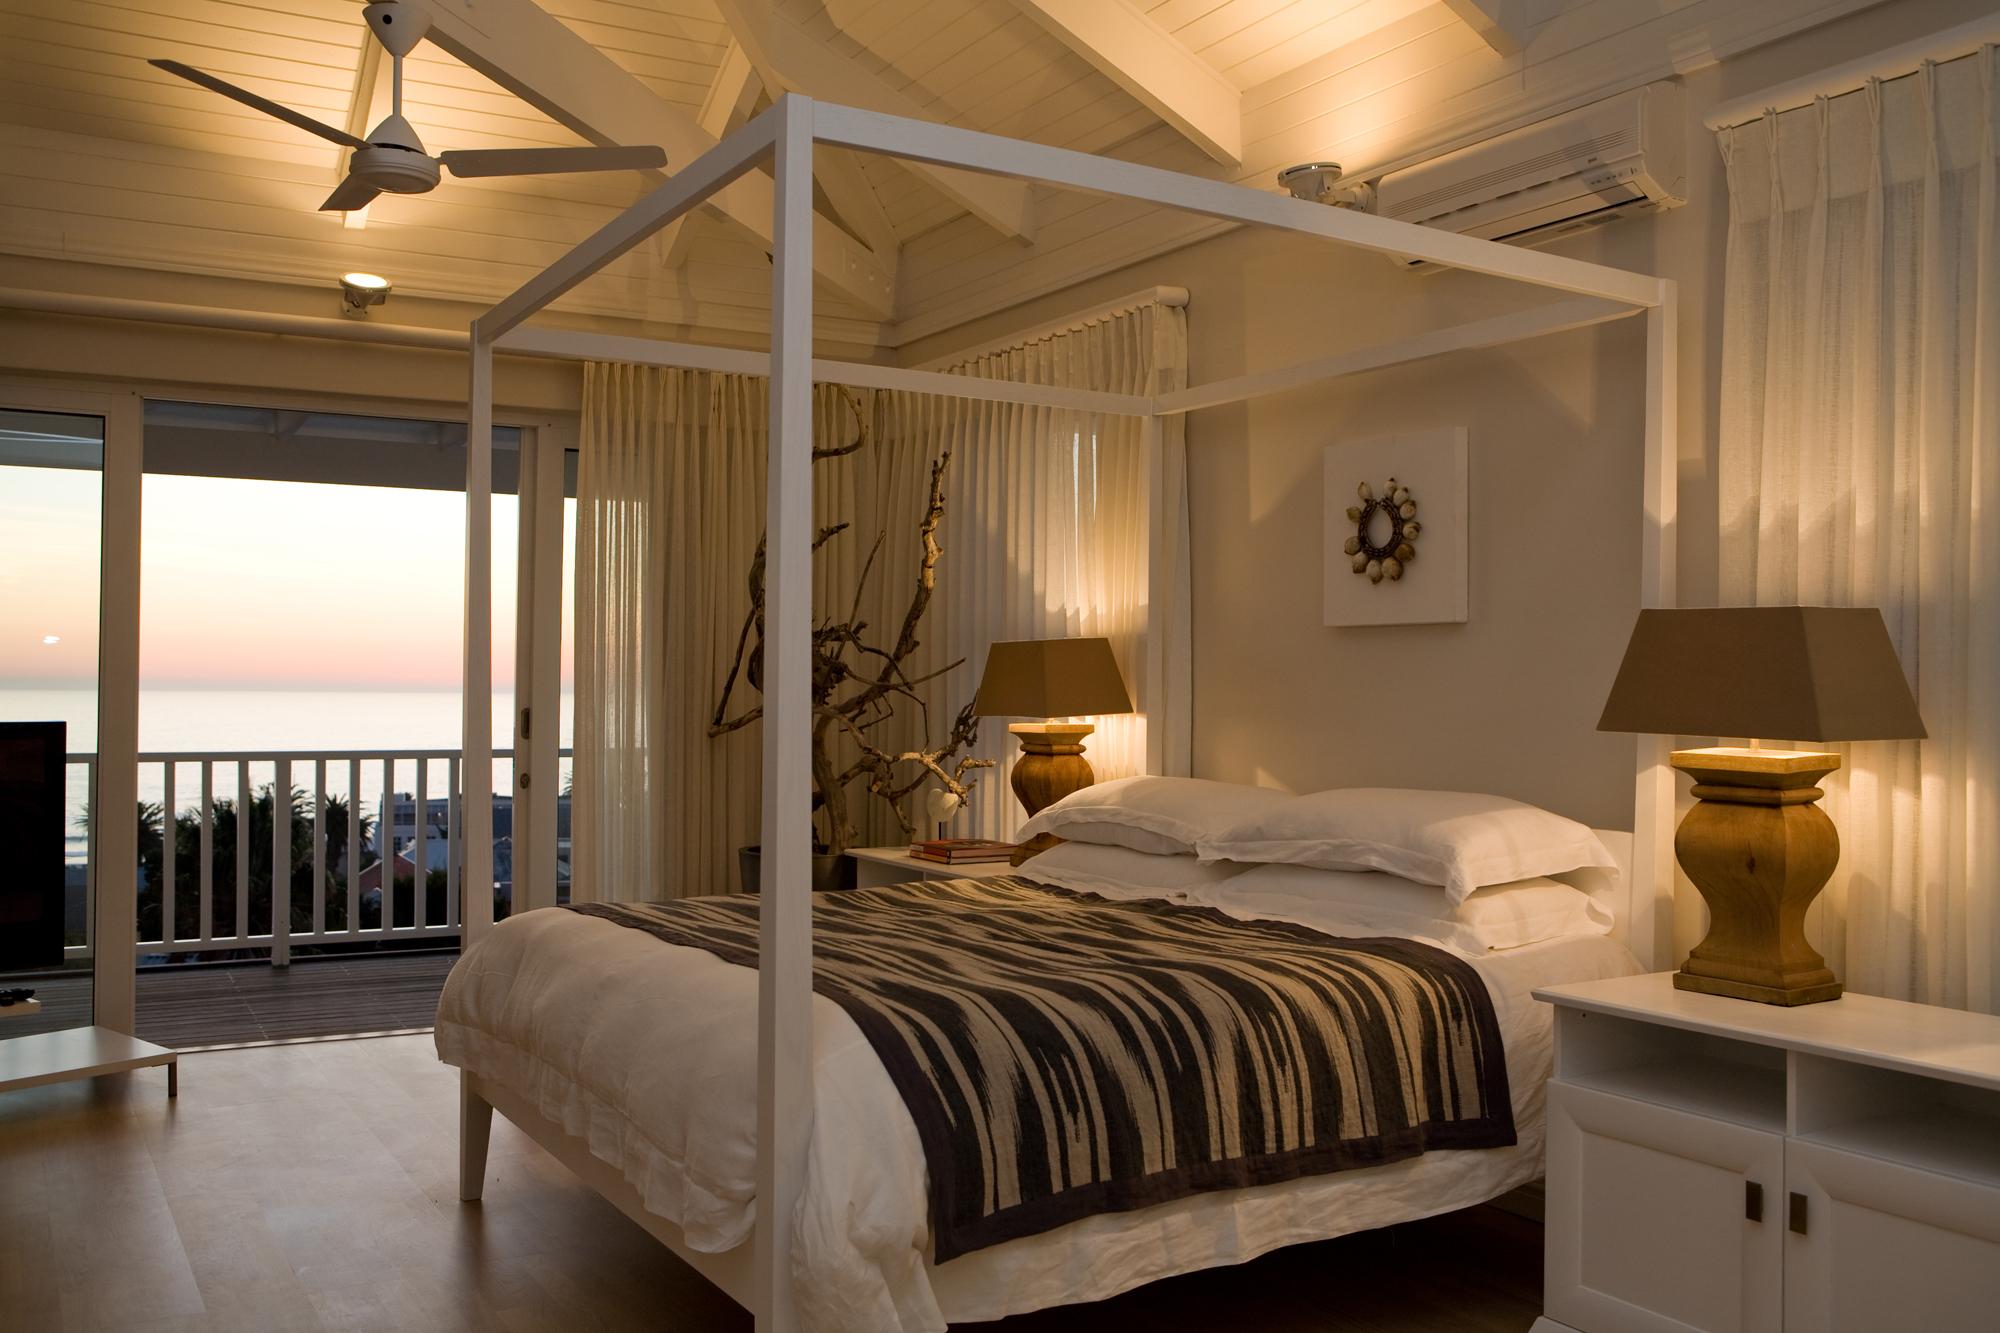 Sea five boutique hotel for A boutique hotel